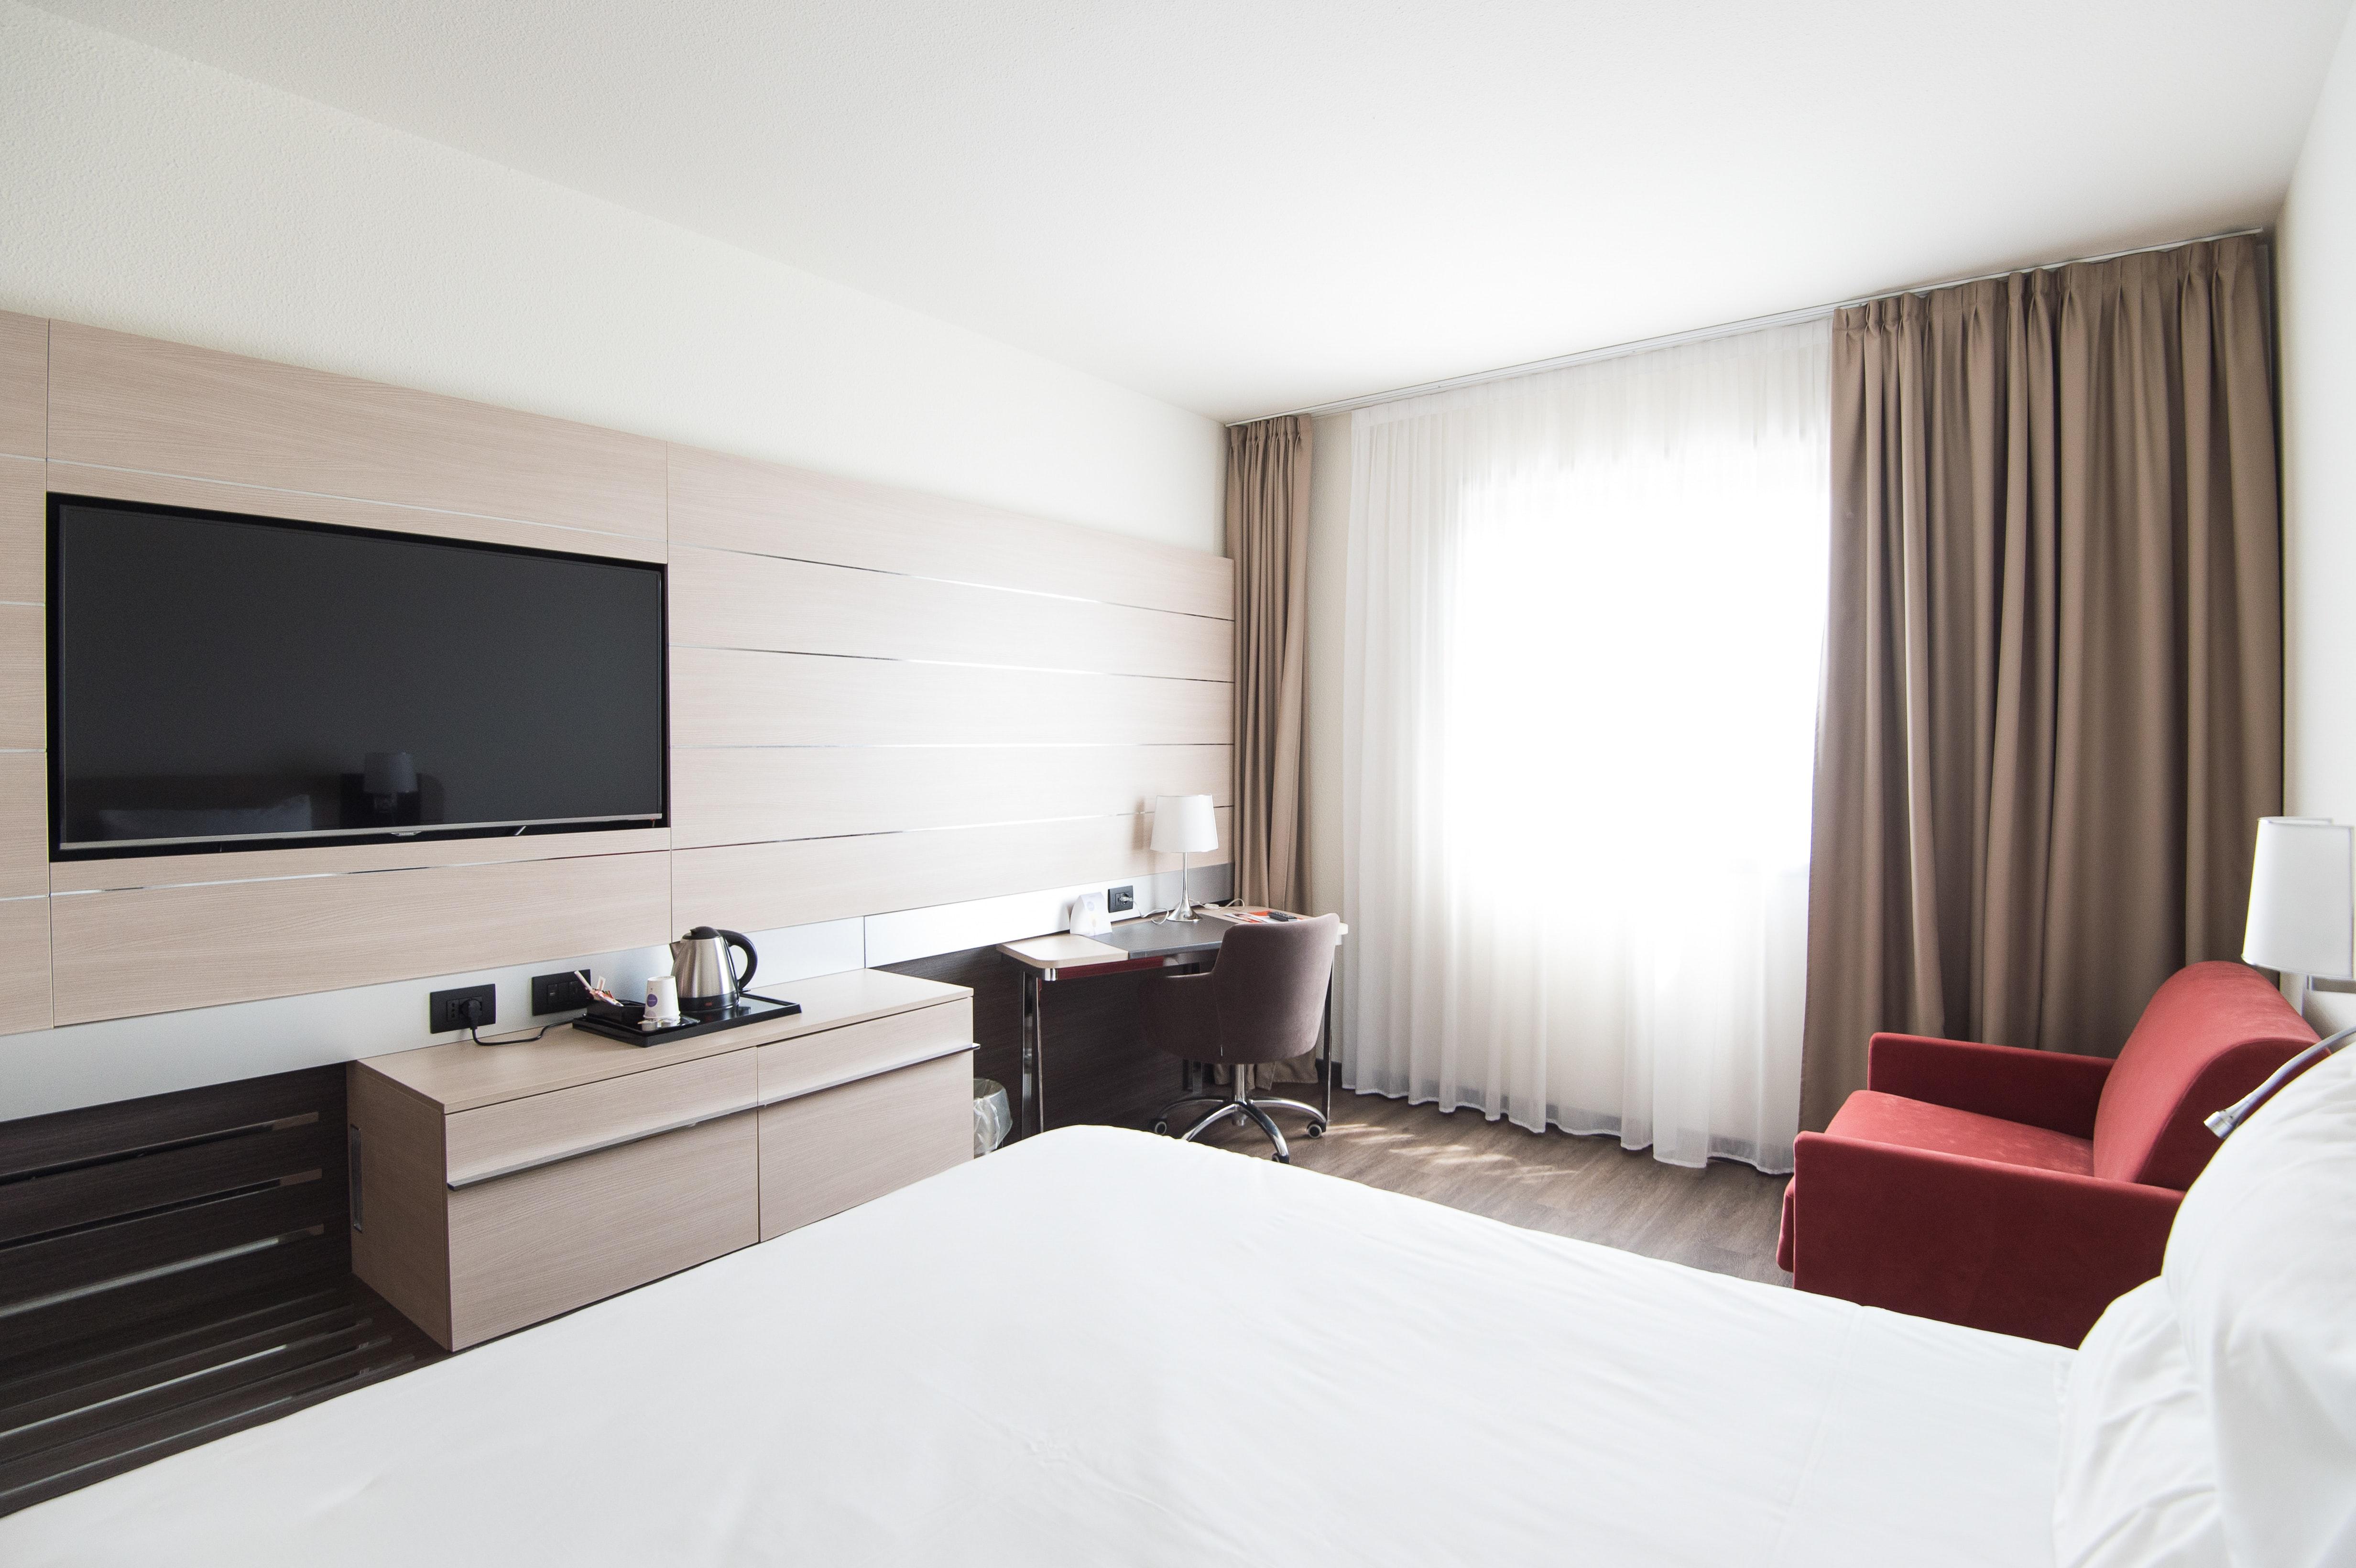 hotel maison d hote coliving chambre